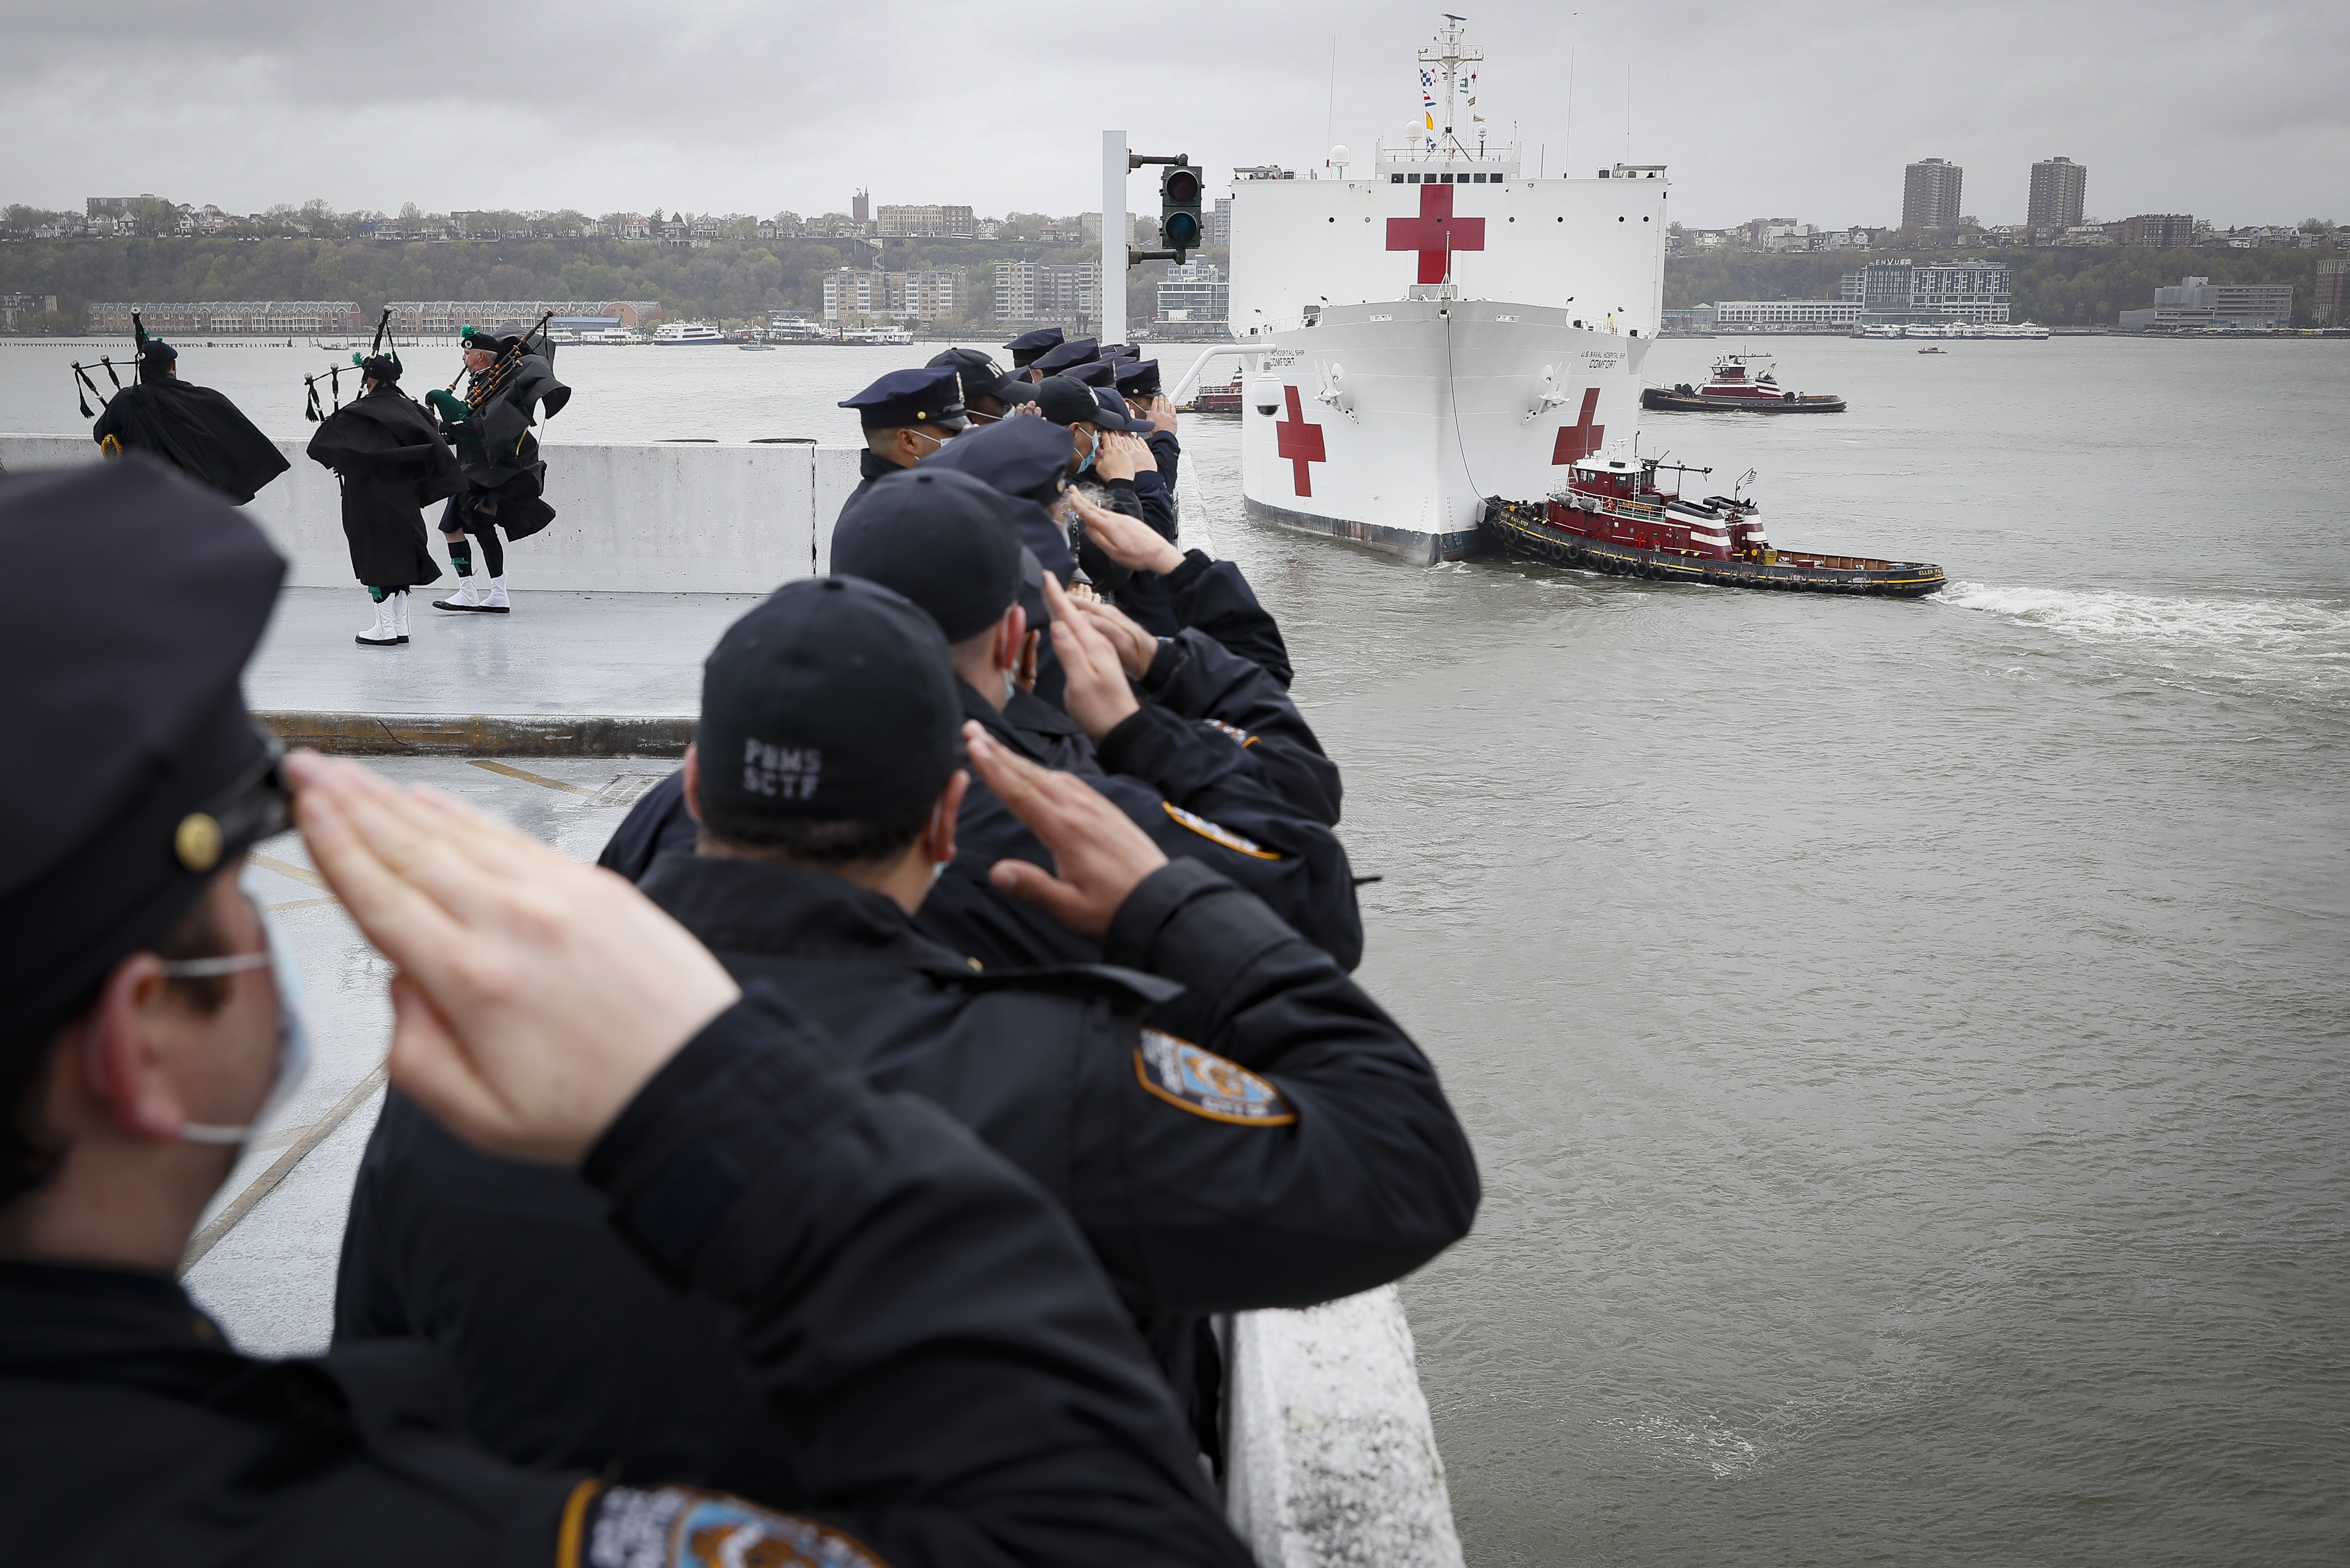 USNS Naval Hospital Ship Comfort